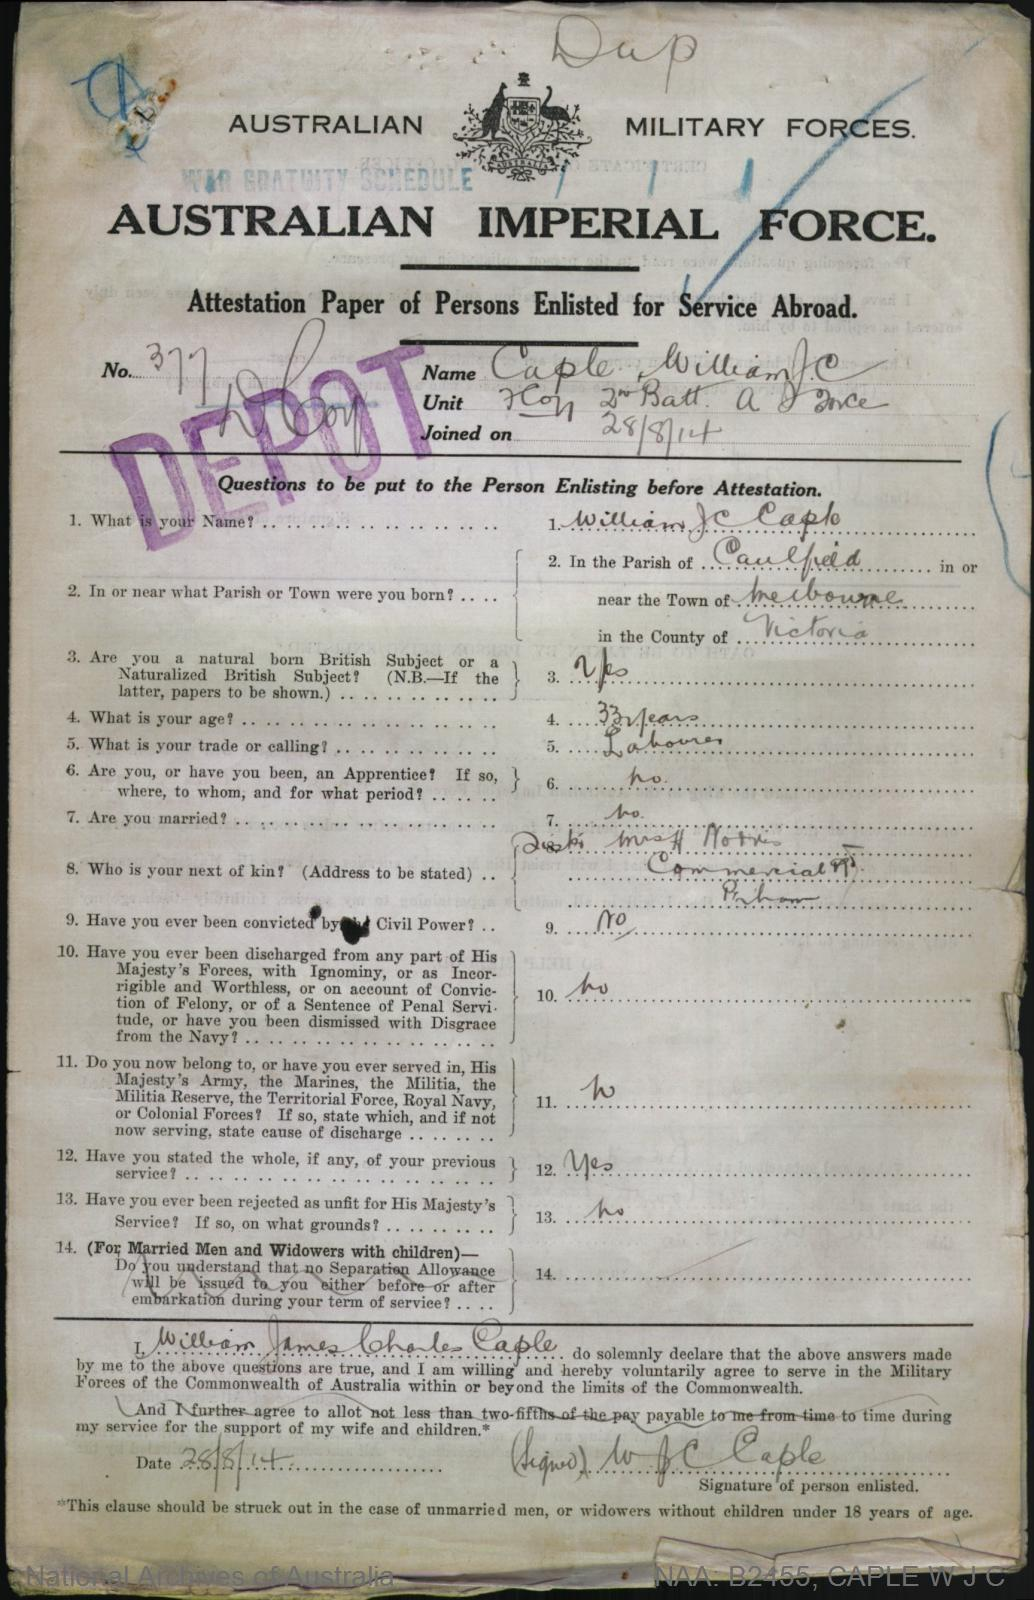 Caple William James Charles : SERN DEPOT 377 : POB Melbourne VIC : POE Randwick NSW : NOK S Norris H